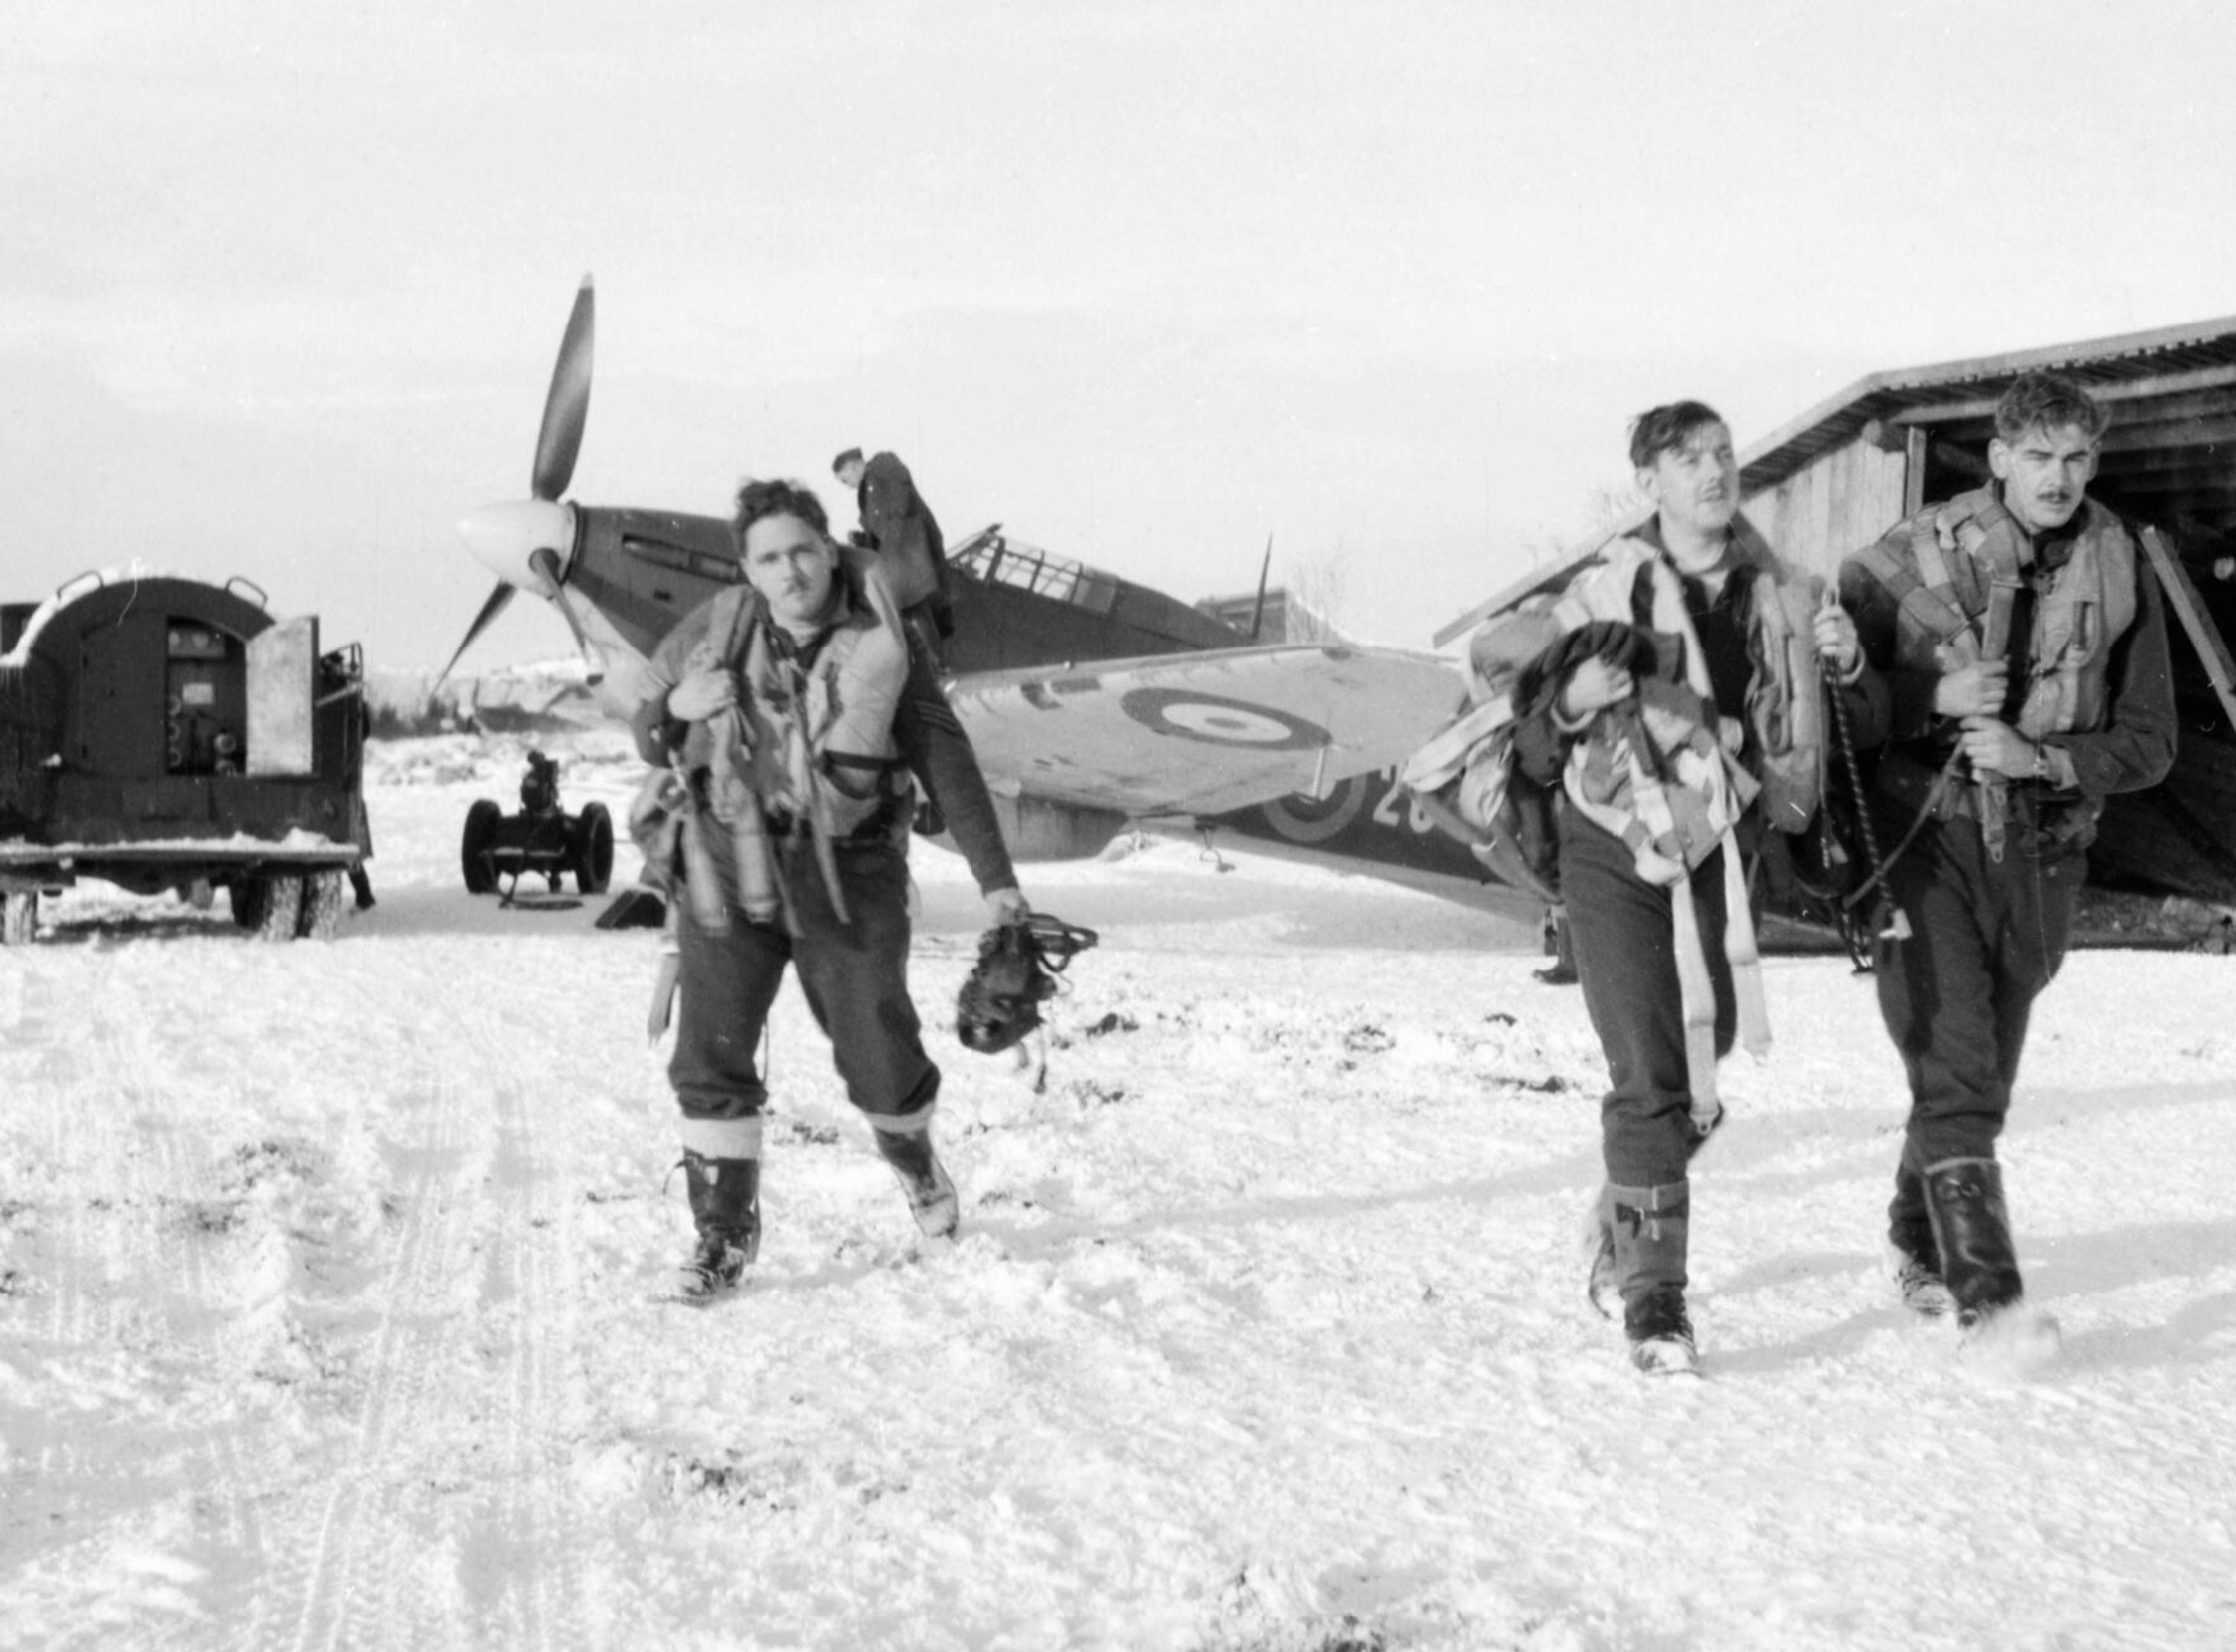 Hurricane IIb RAF 151 Wing 134Sqn aircrew walk towards their aircraft Vaenga USSR Oct 1941 IWM CR60